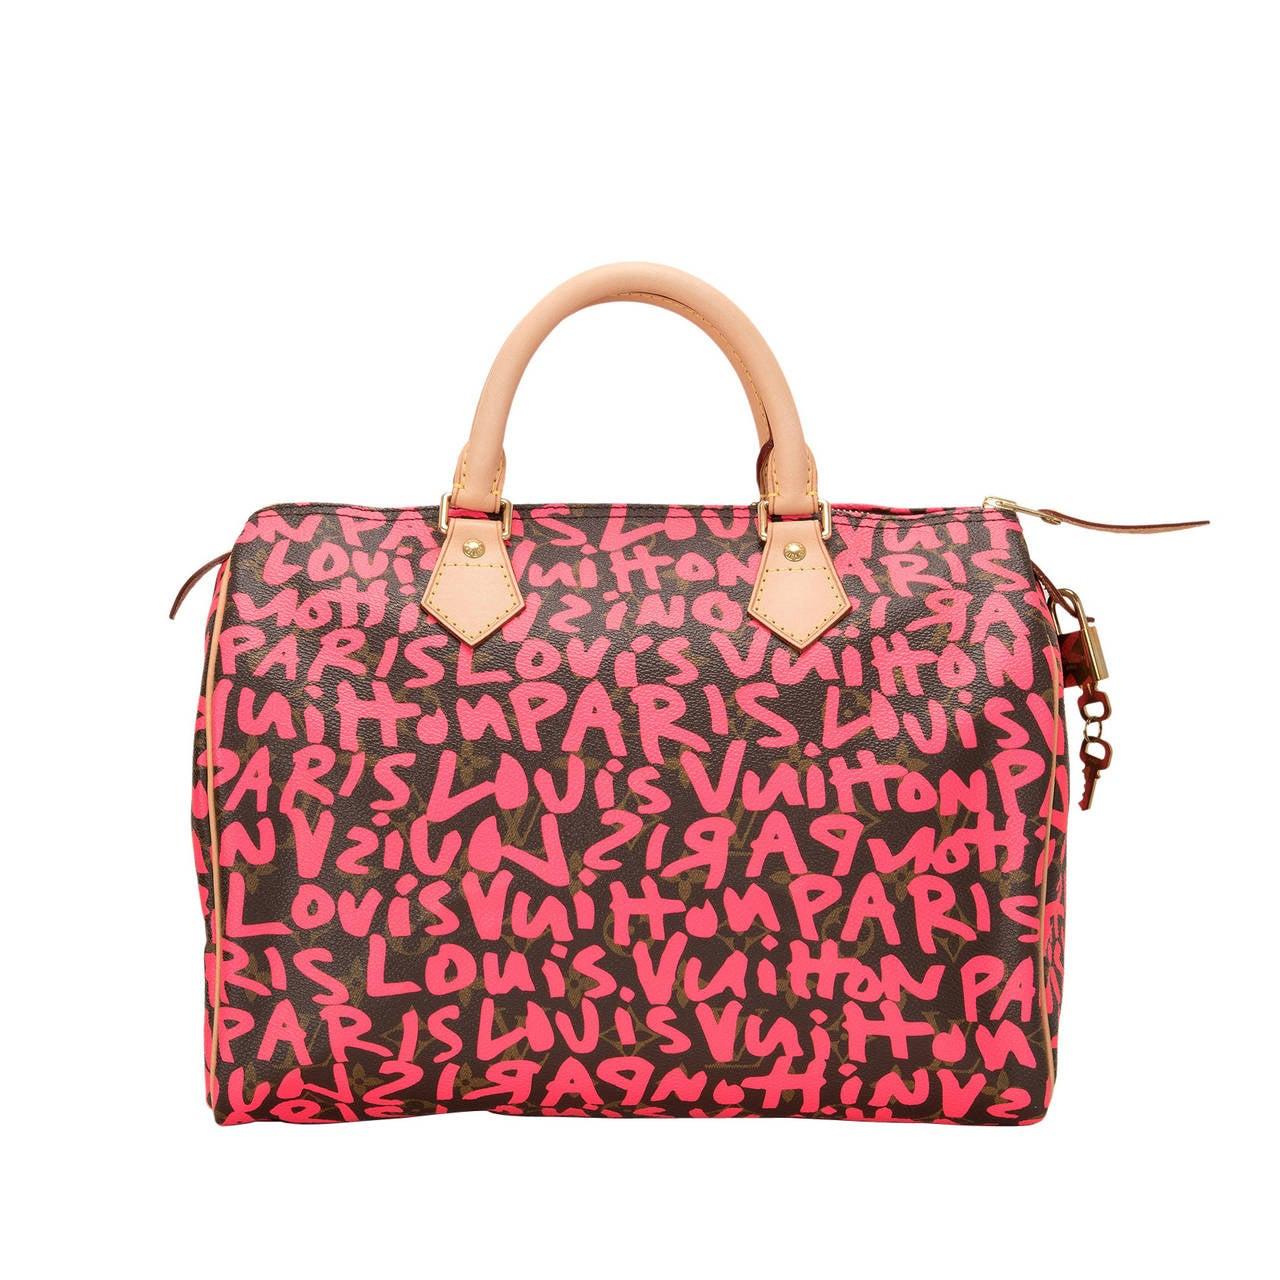 Louis Vuitton Fuchsia Pink Monogram Graffiti Speedy 30 For Sale